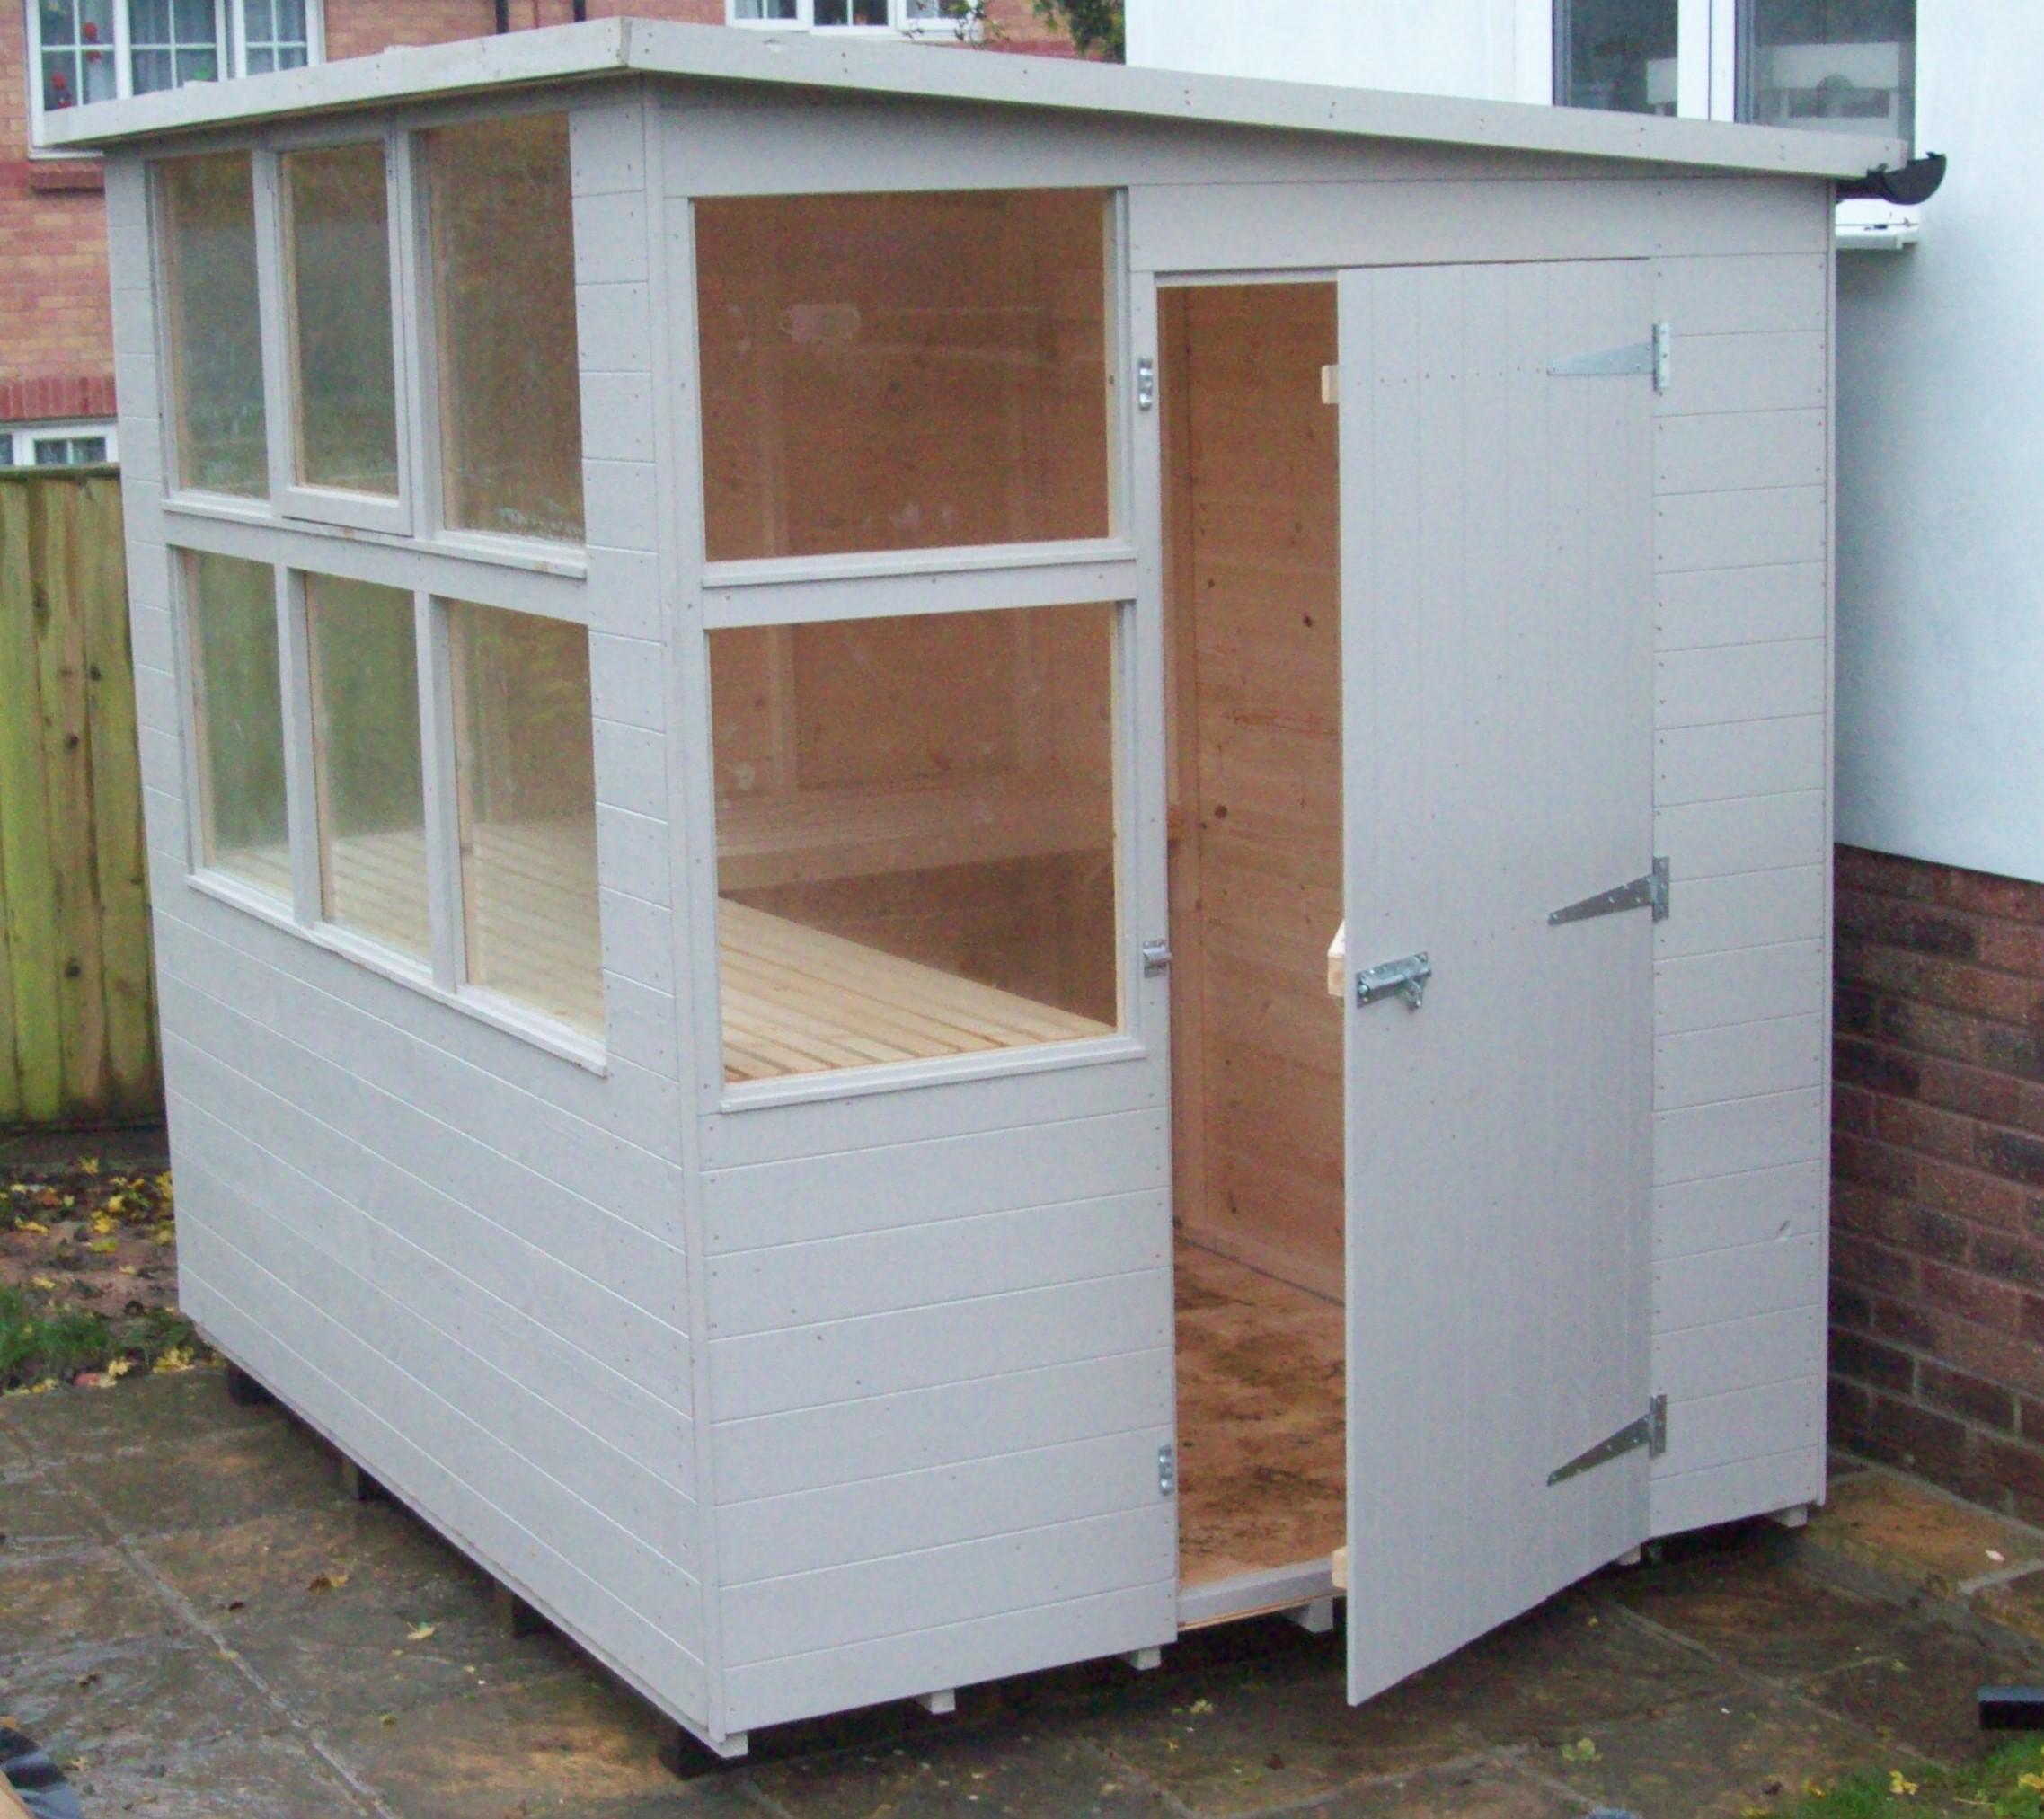 dsc shed garden gardening storage pictures whimsical sheds ideas potting plans designs